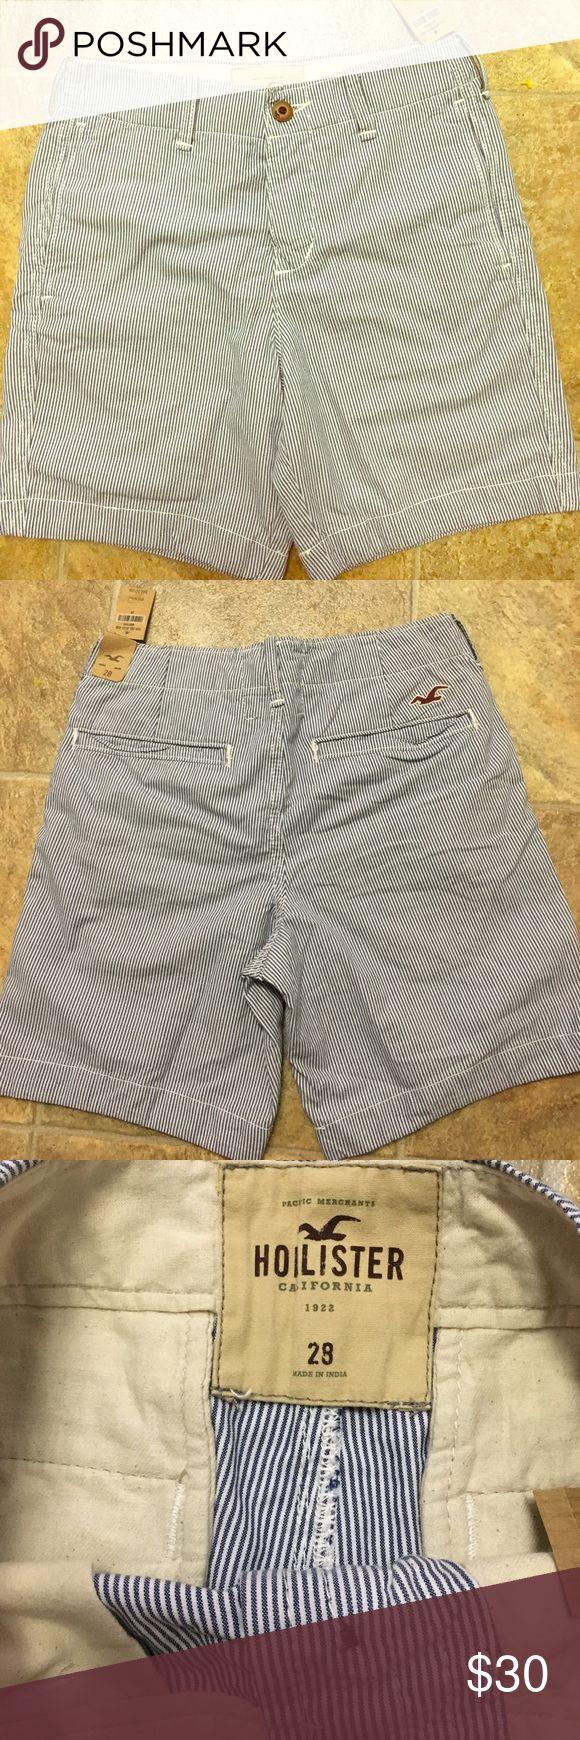 Hollister guys shorts NWT Hollister Shorts Flat Front